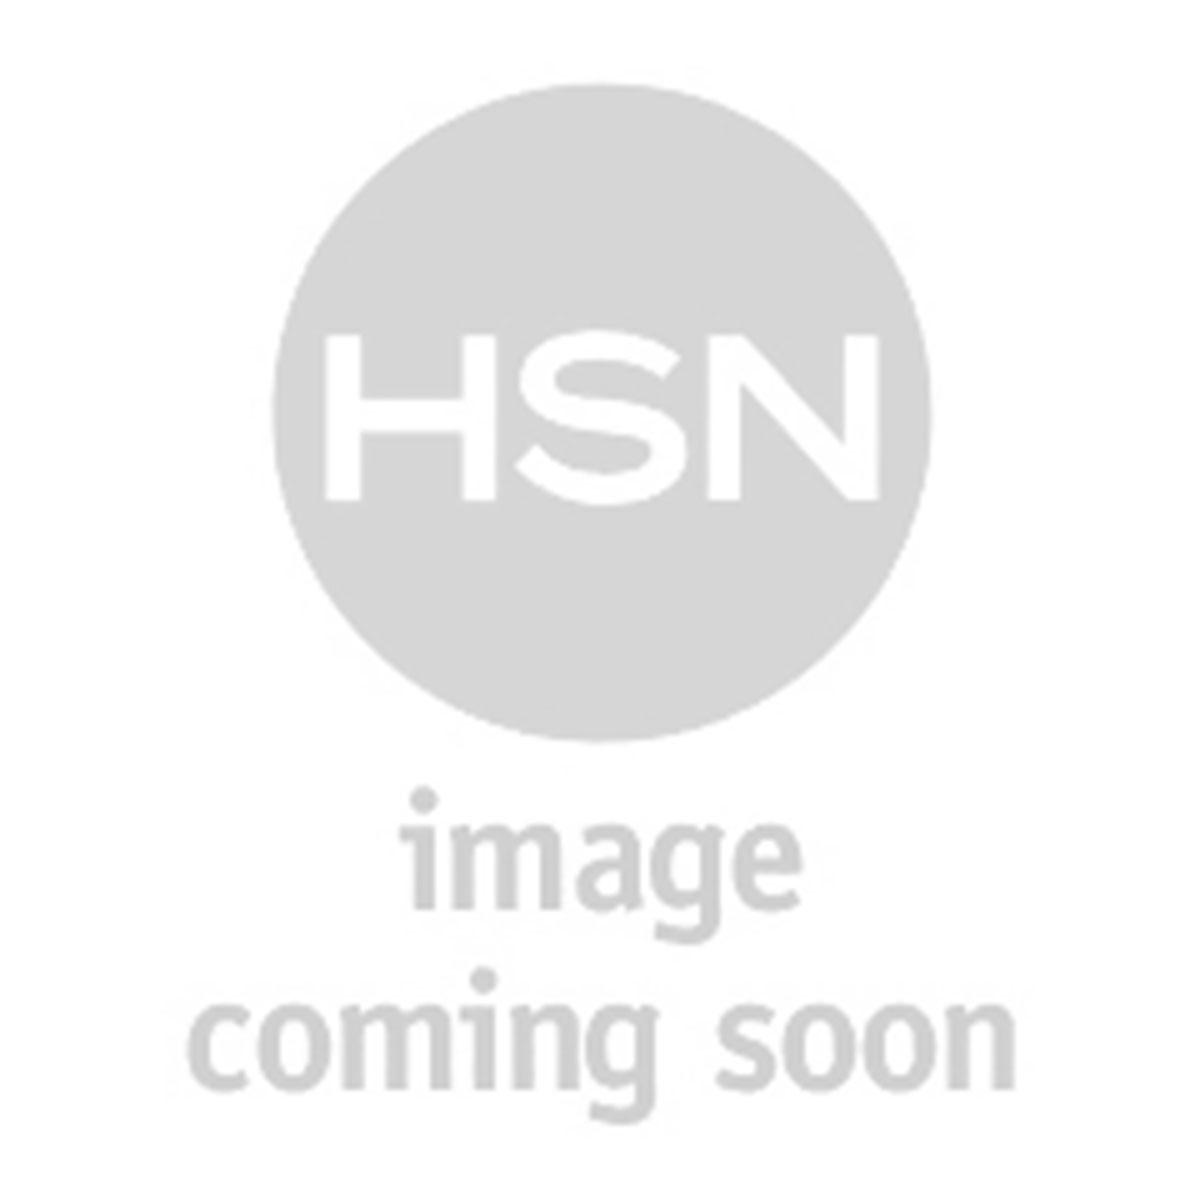 Desk Top Organizers  Home Ideas